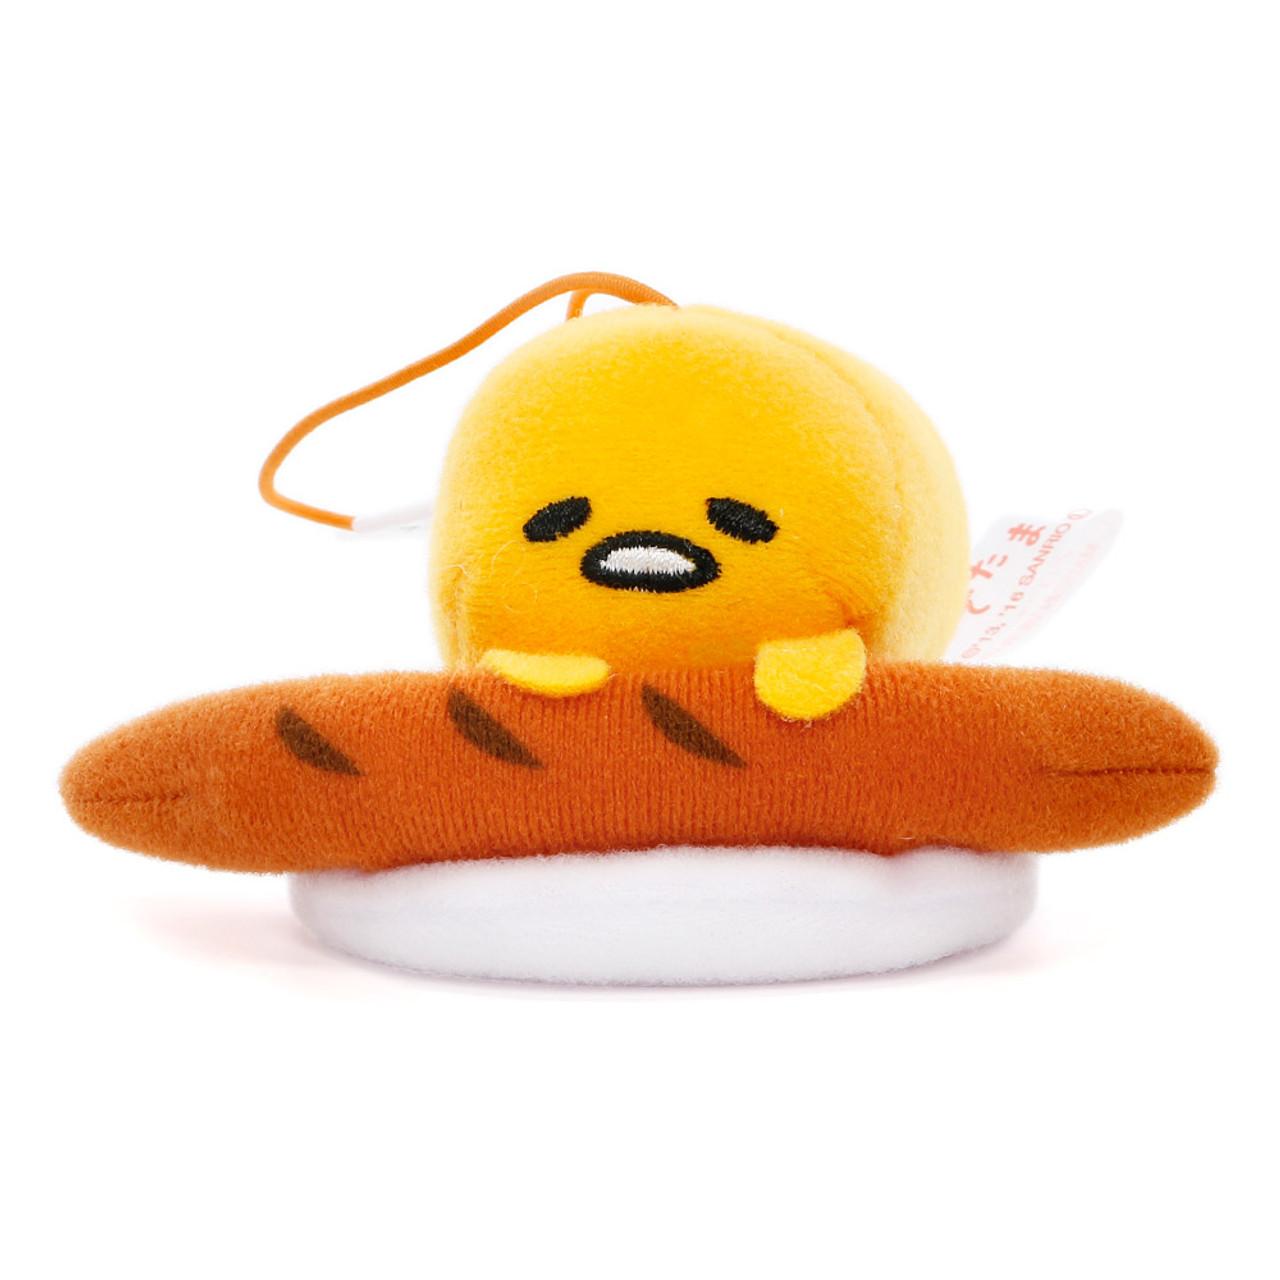 Sanrio Gudetama Lazy Egg Sleeping Mascot Plush Charms - Sausage ( Front View )